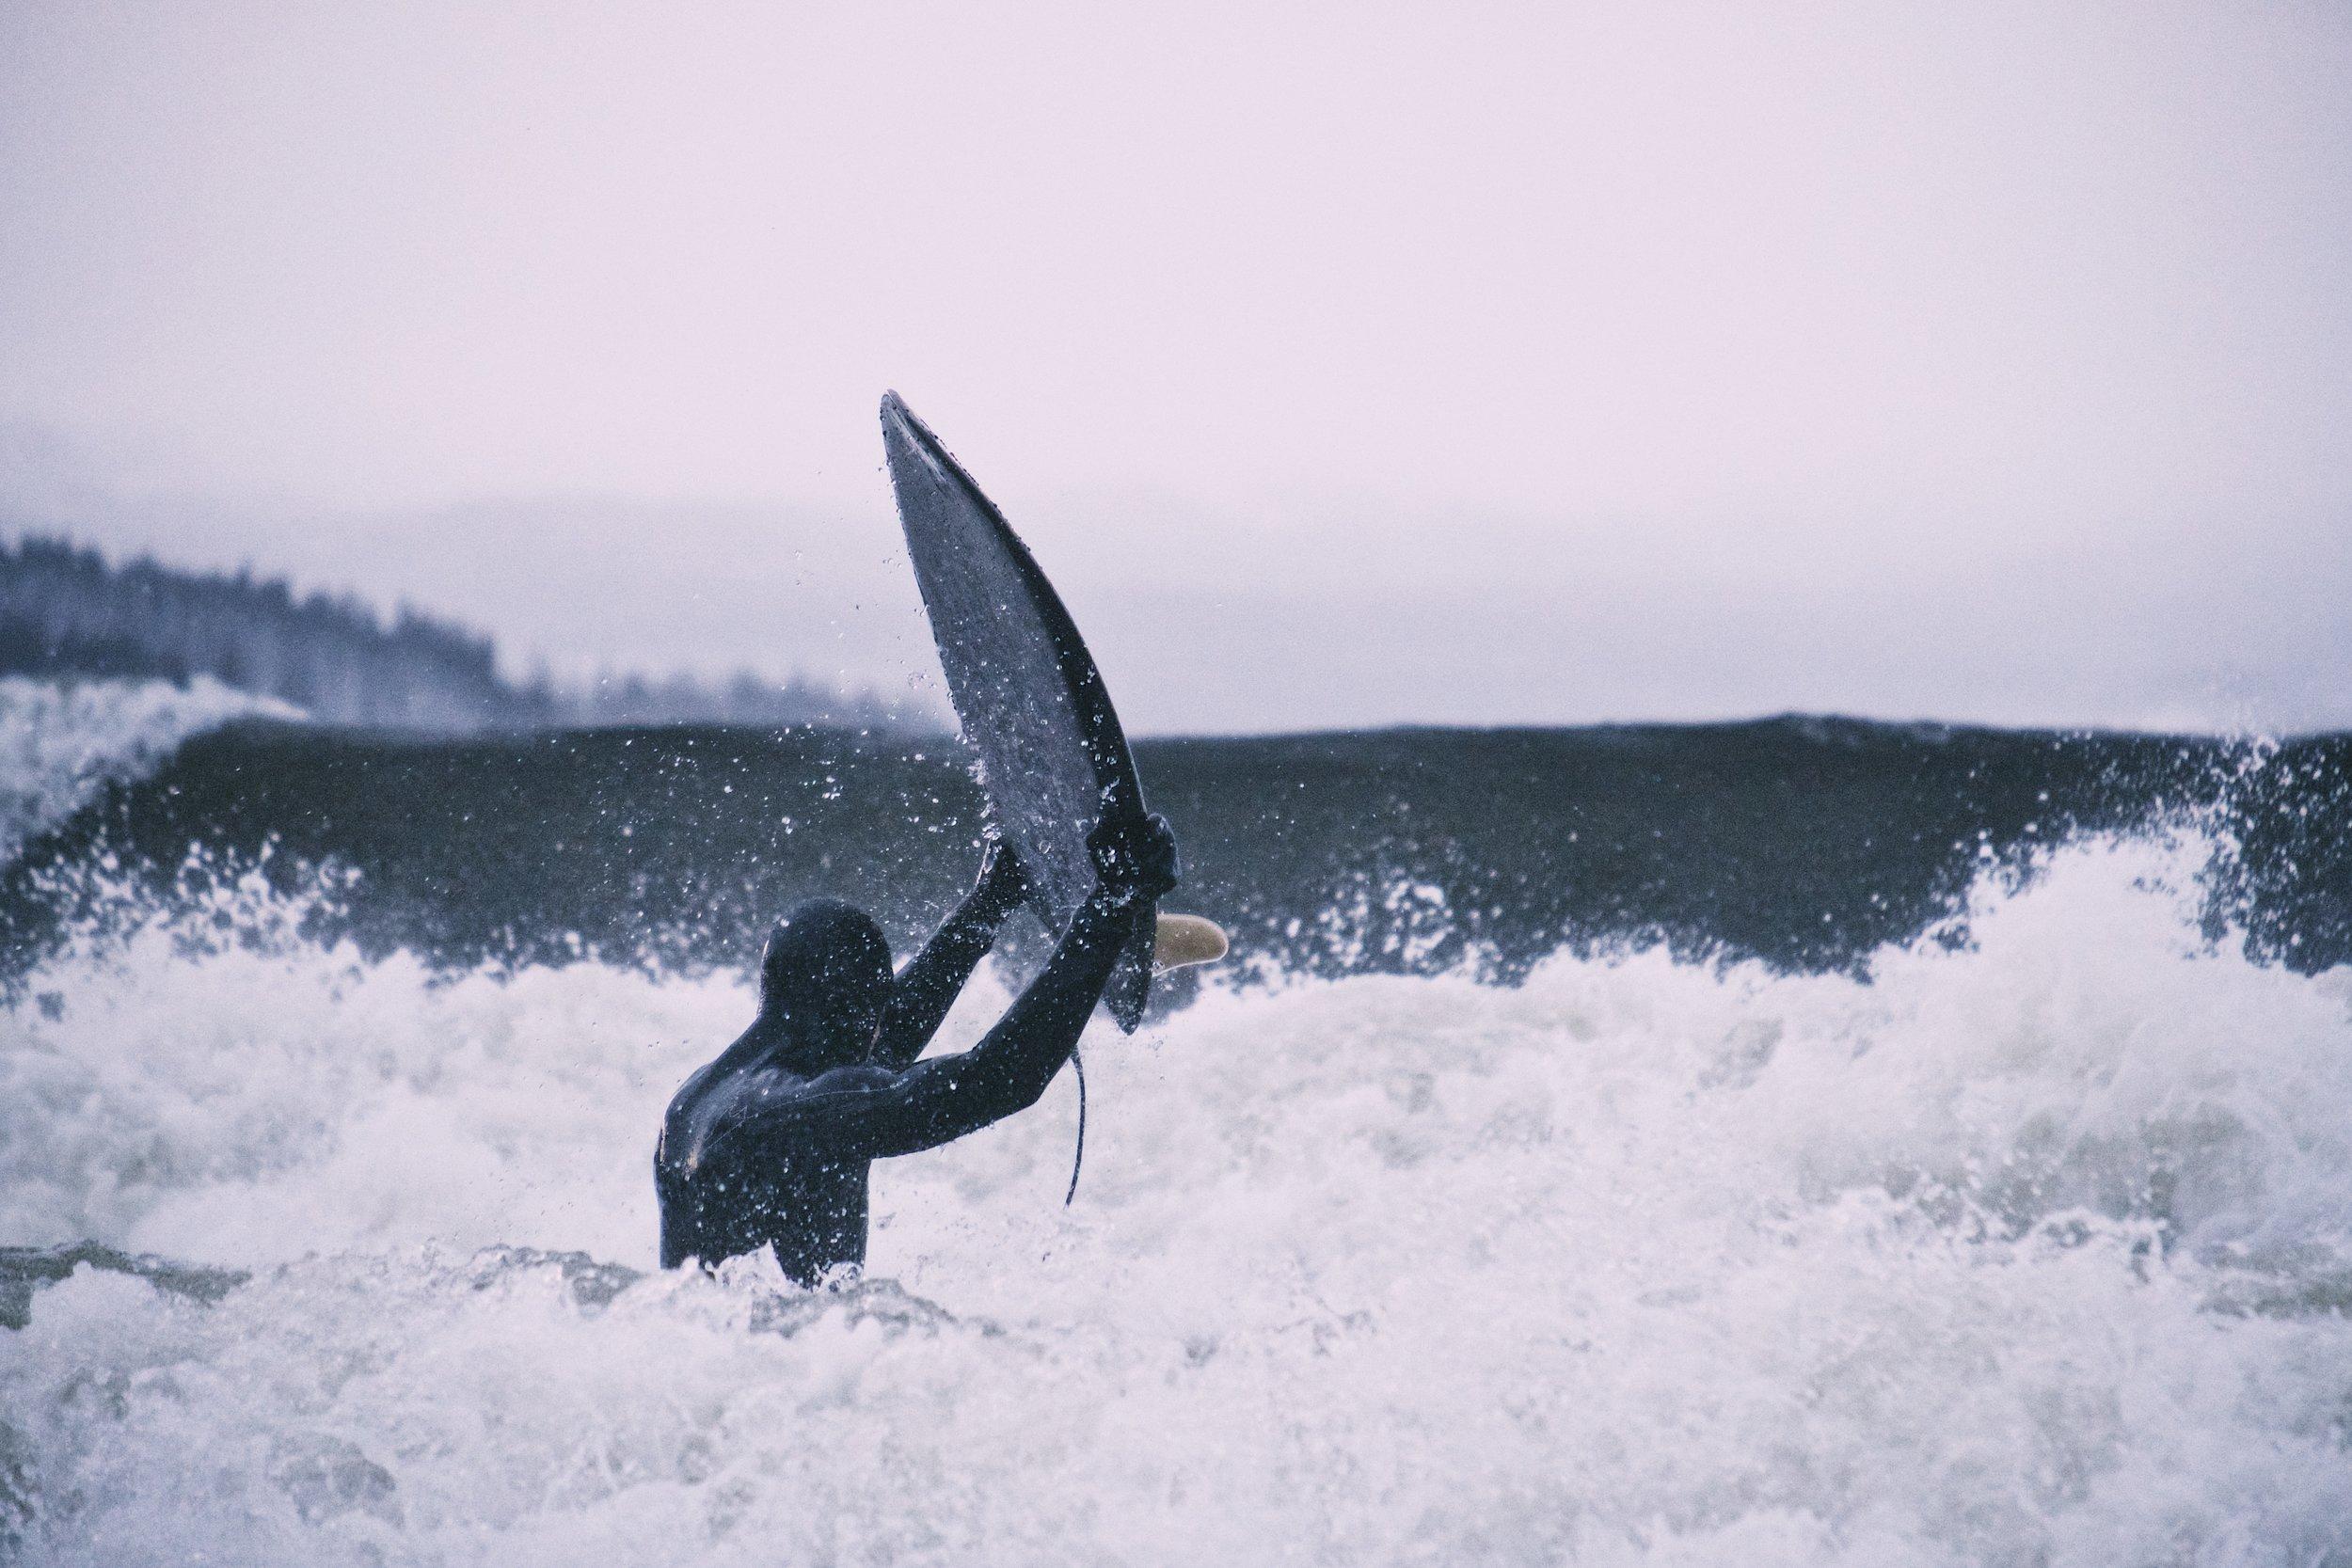 Yep, you can surf too - Pete Brockman